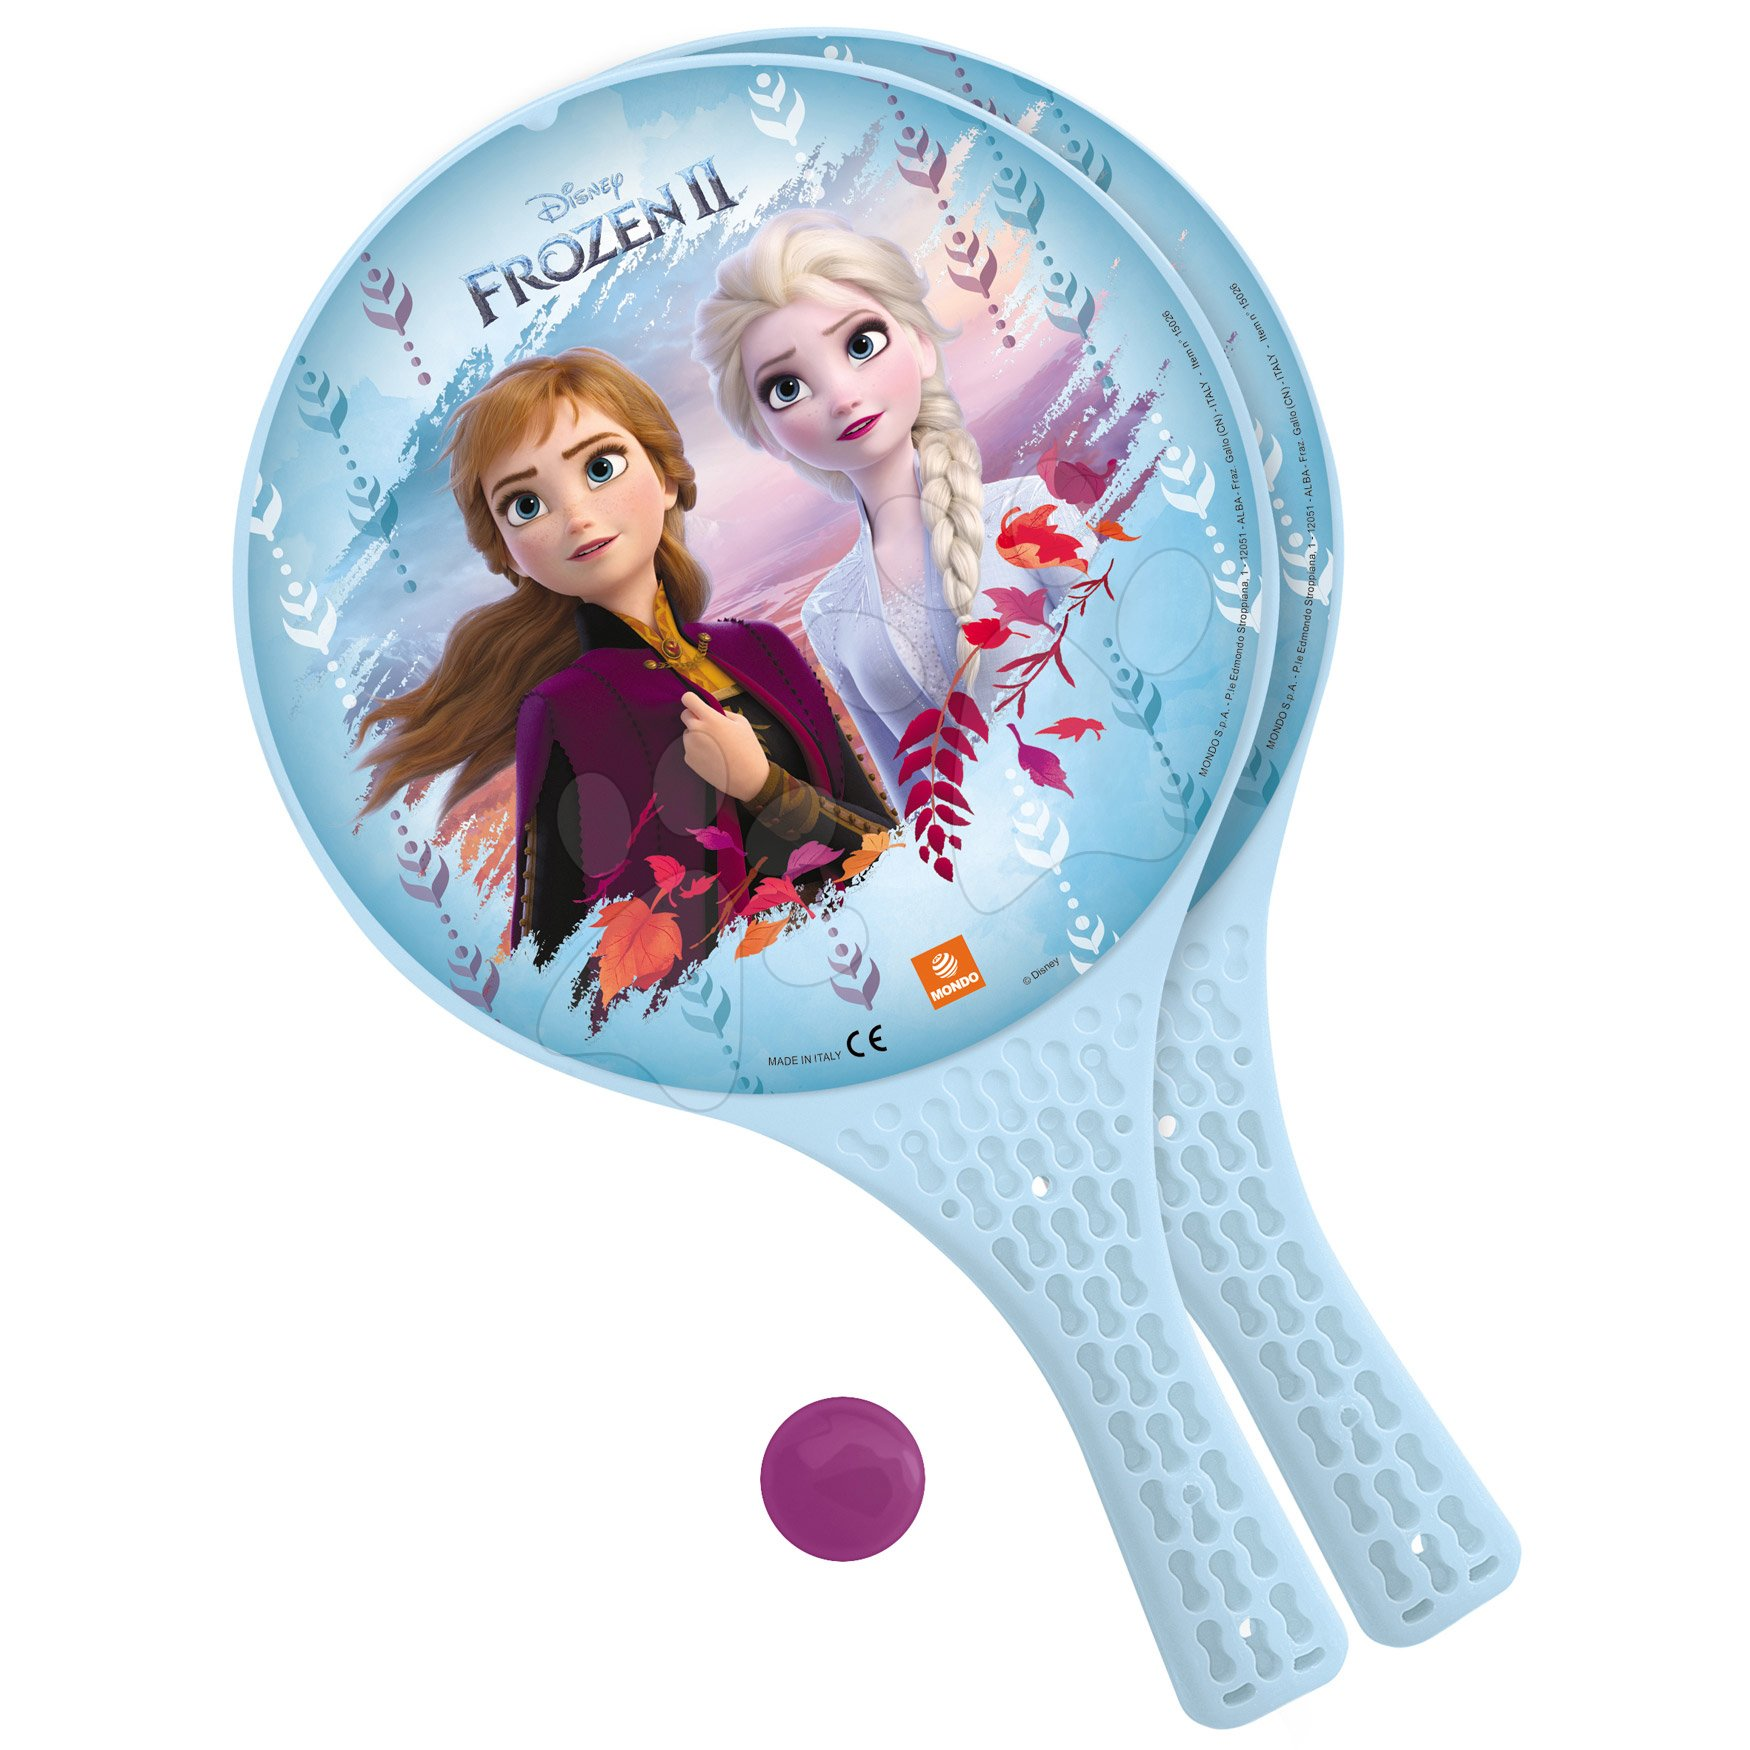 Tenis - Plážový tenis Frozen Mondo s 2 raketami a loptičkou